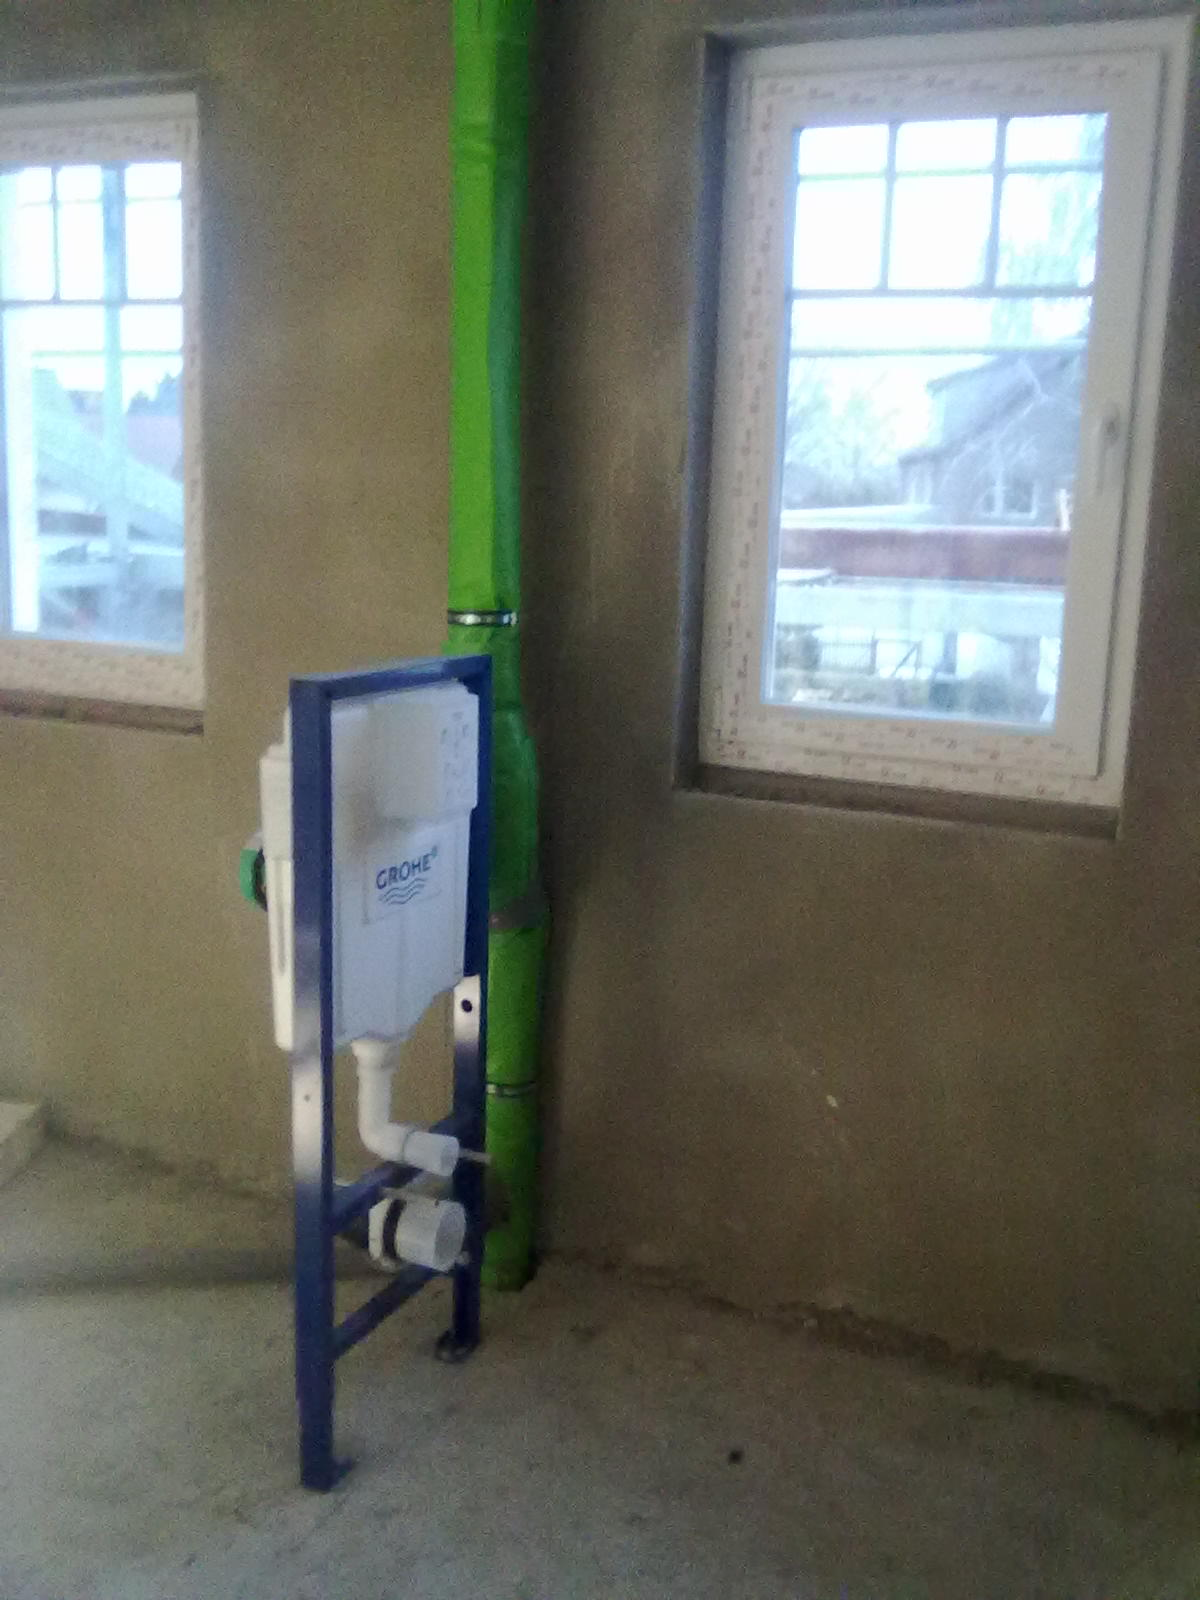 wir bauen ein haus januar februar 2011 sanit r fu bodenheizung solarkollektoren. Black Bedroom Furniture Sets. Home Design Ideas